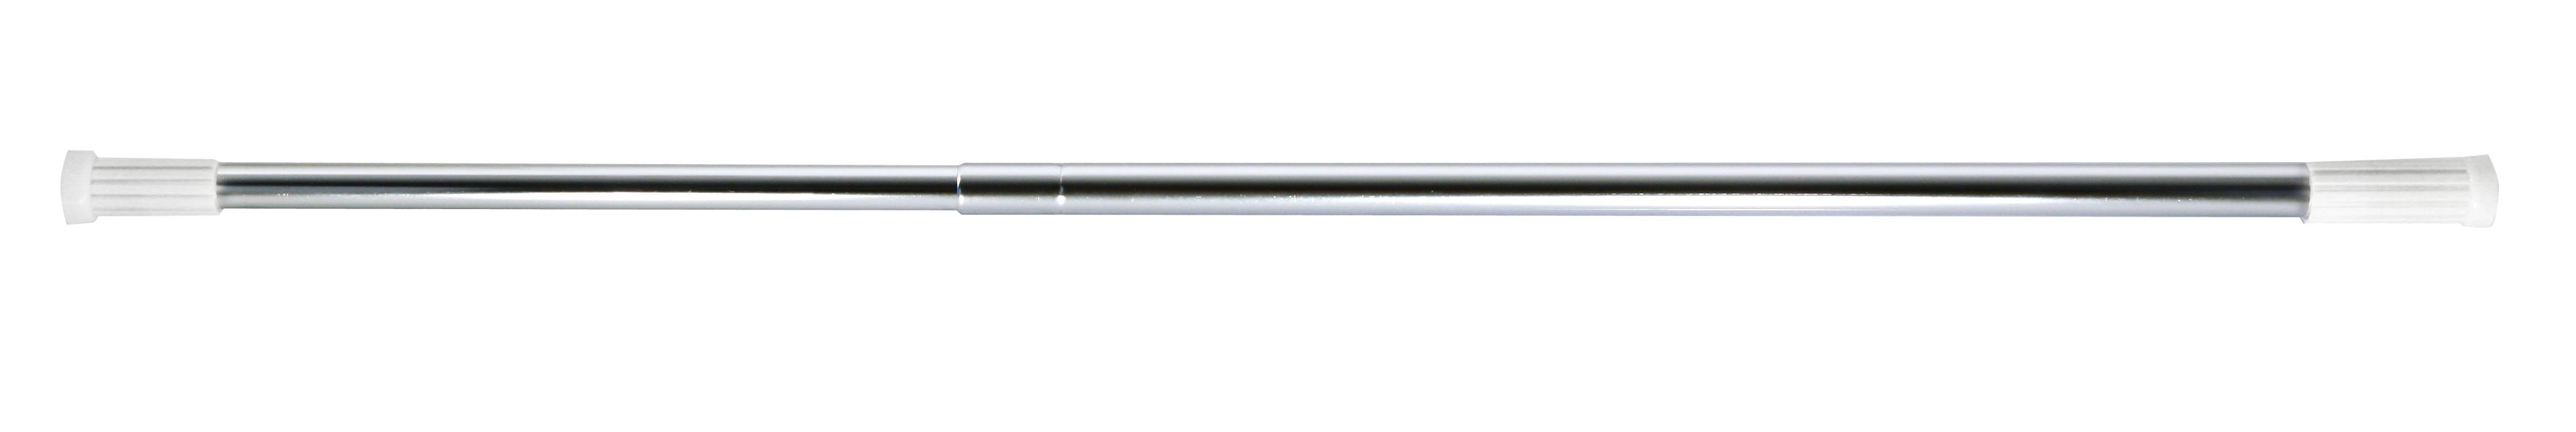 Tyč na sprchový závěs Olsen 110-200 chrom, skladem